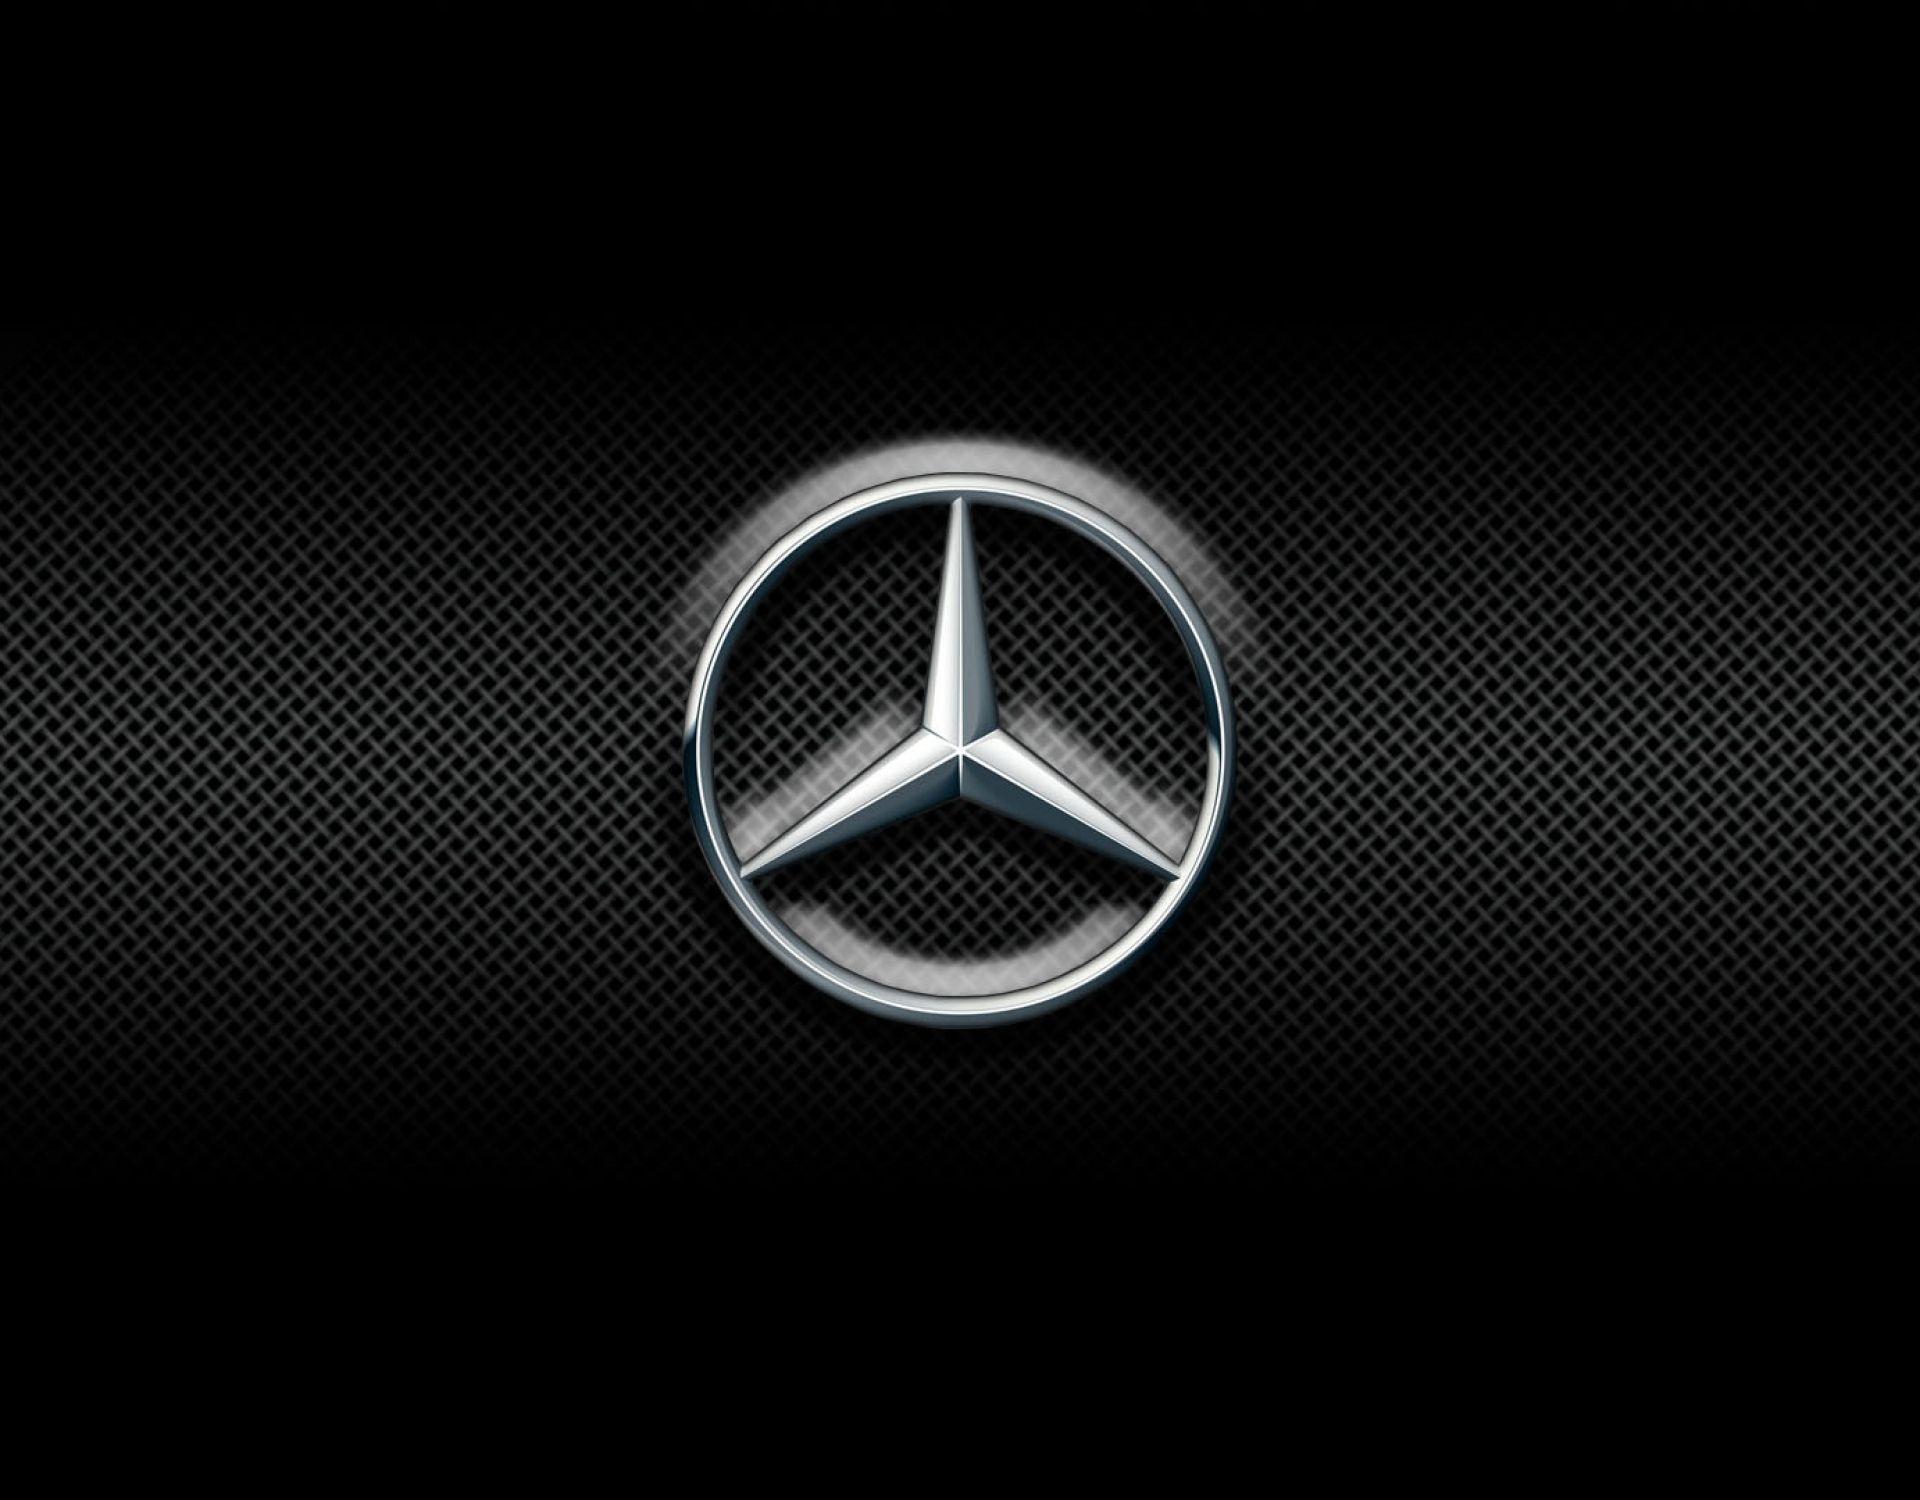 Mercedes Benz Hd Wallpapers Goruntuler Ile Arabalar